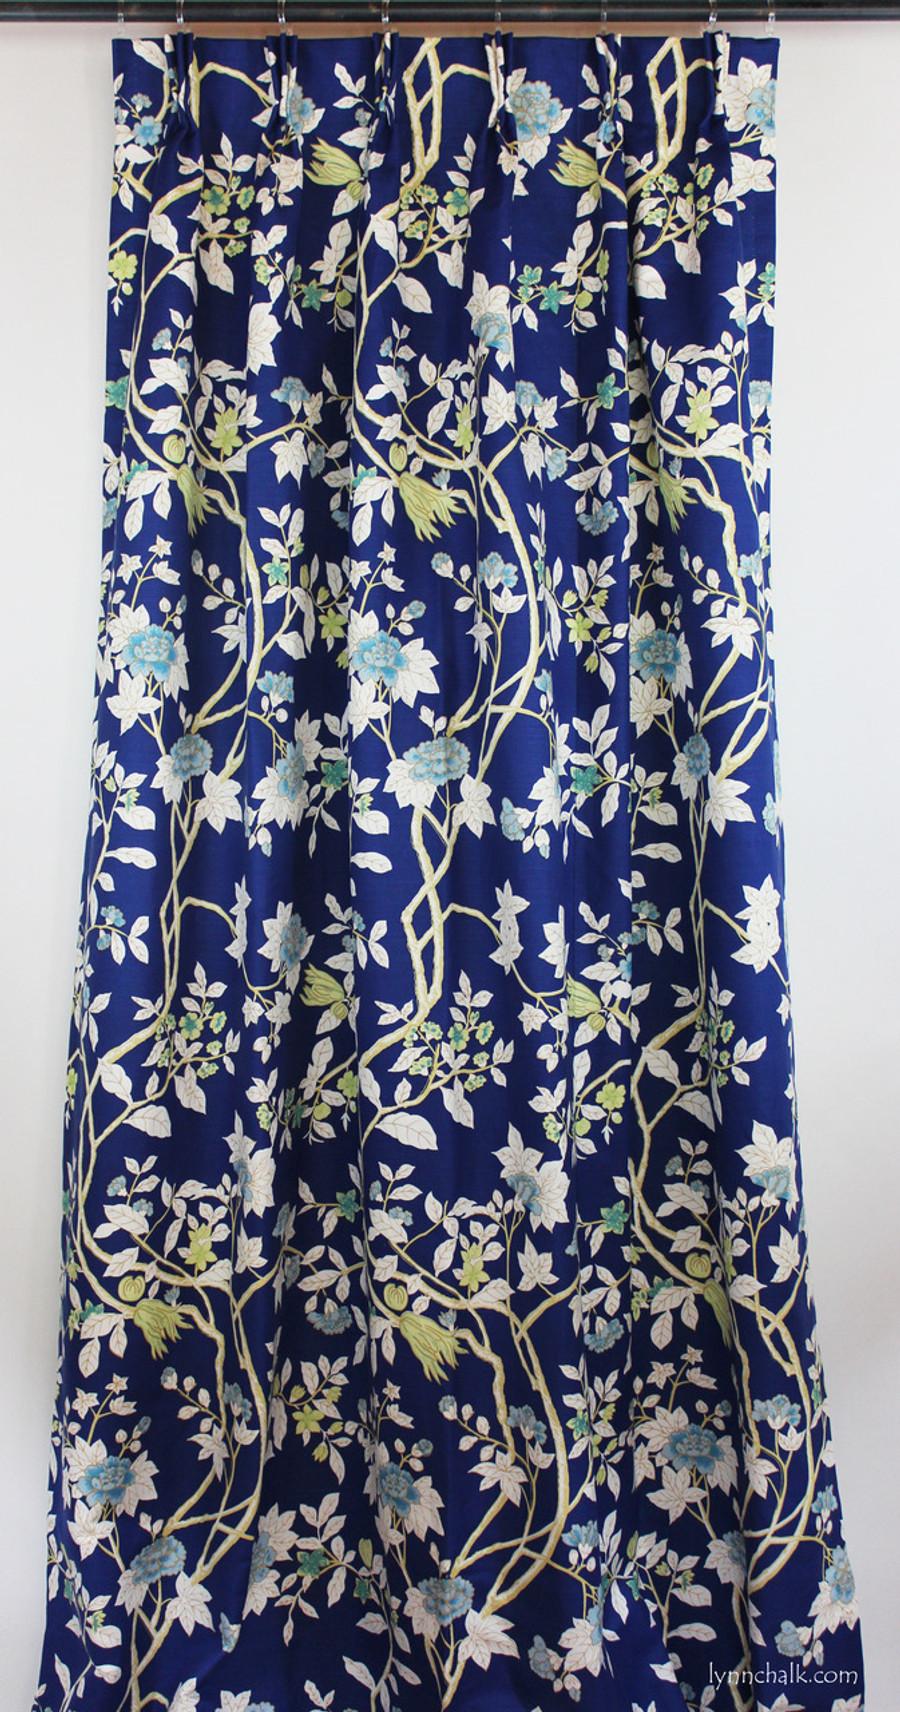 Custom Drapes 1 1/2 Widths by Lynn Chalk in Quadrille Happy Garden New Navy on Tint.